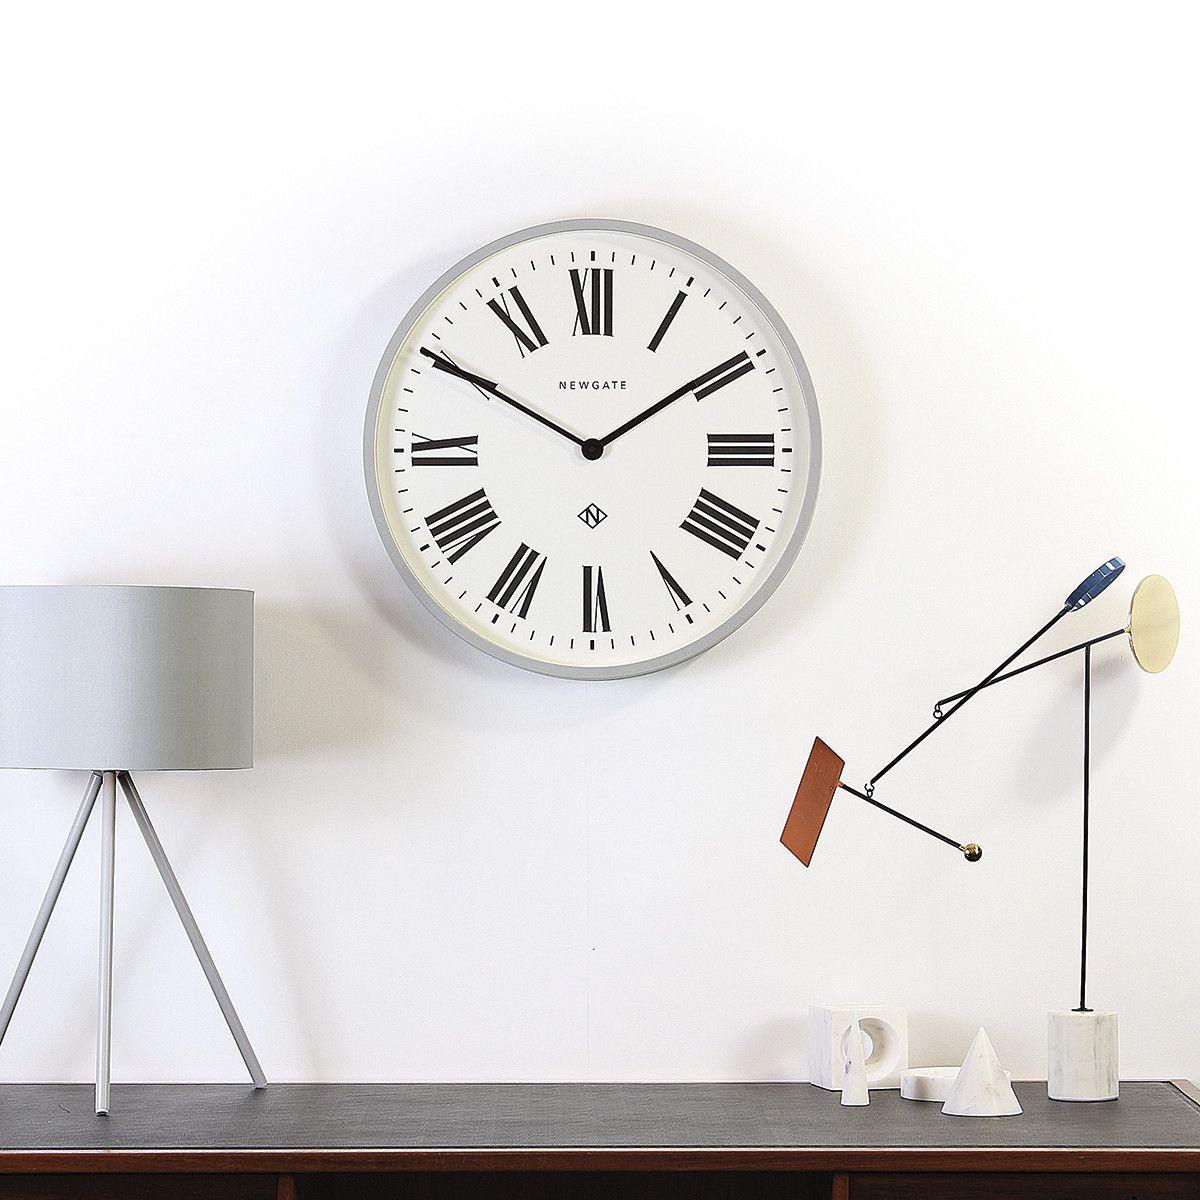 World Style Shots Newgate ItalianWall Clocks Grey qzMVSpU